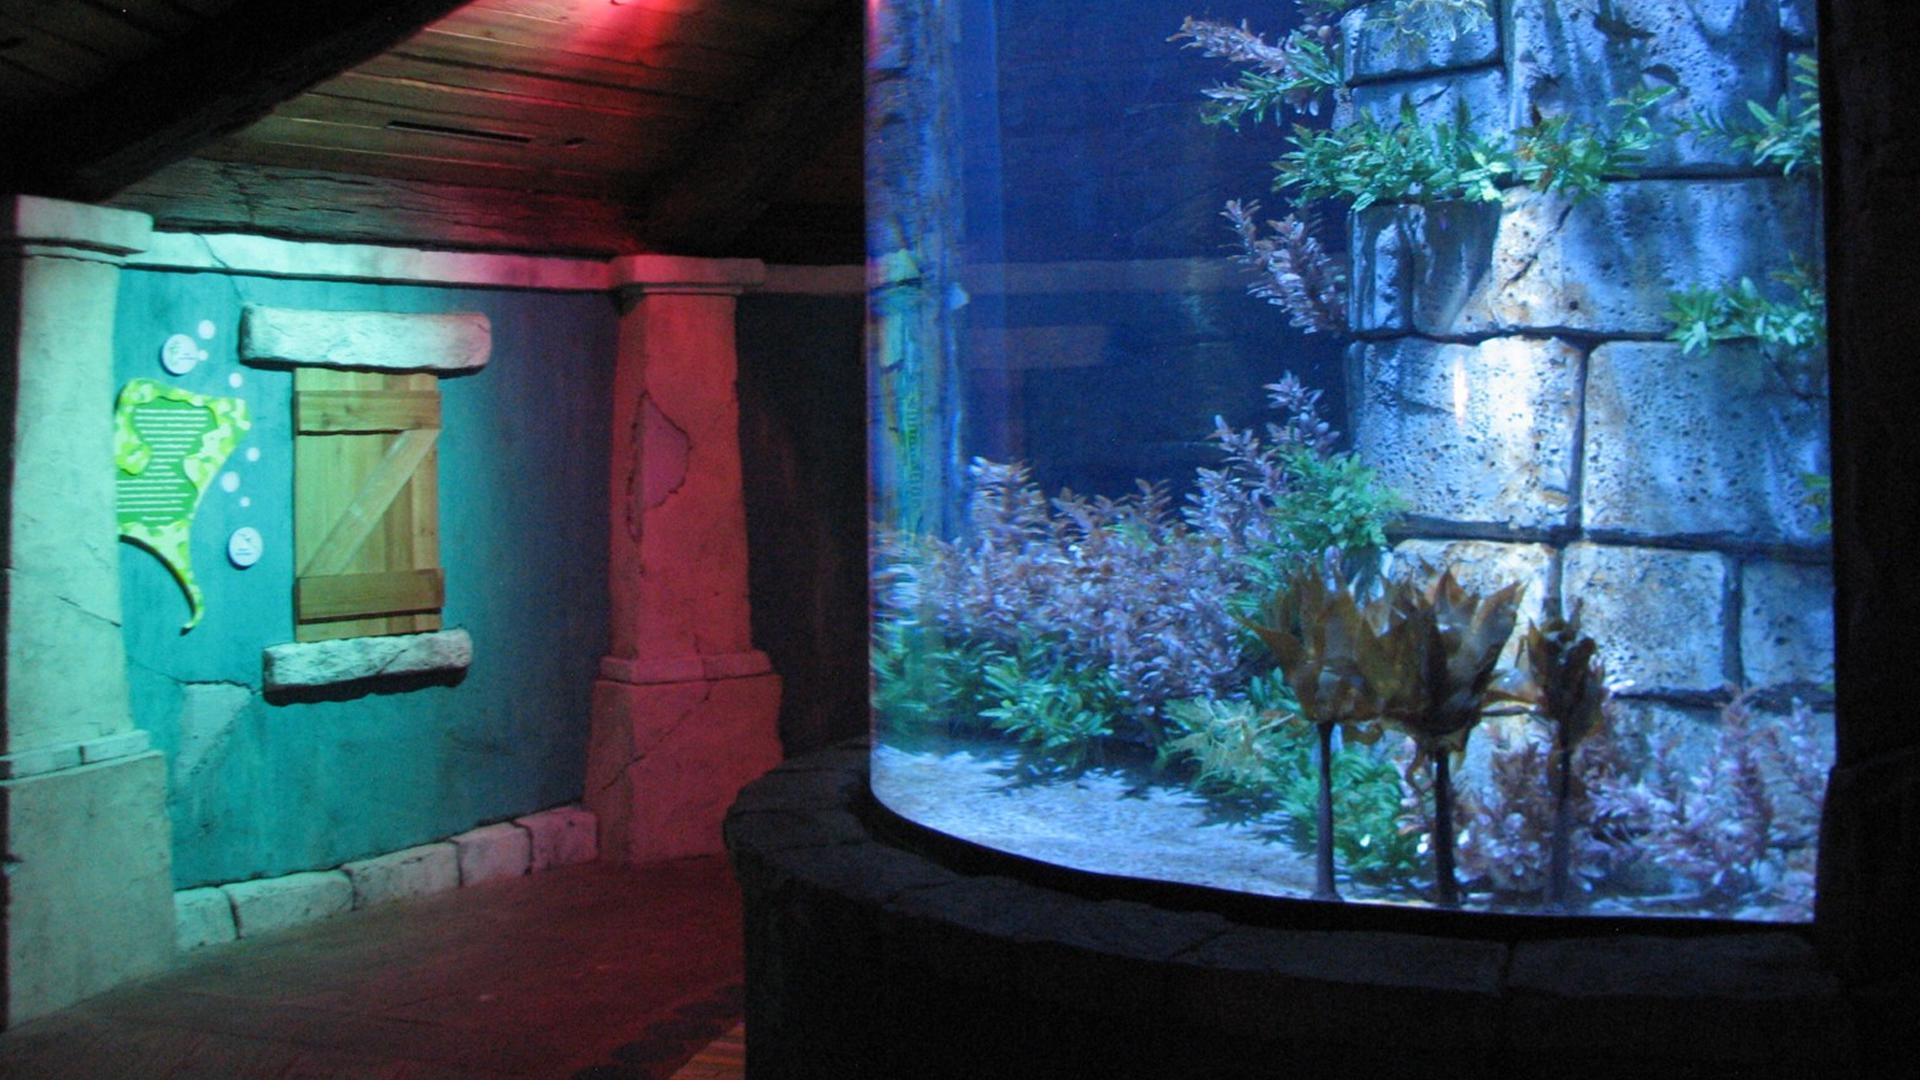 Manta Aquarium - Orlando Tickets, Hotels, Packages